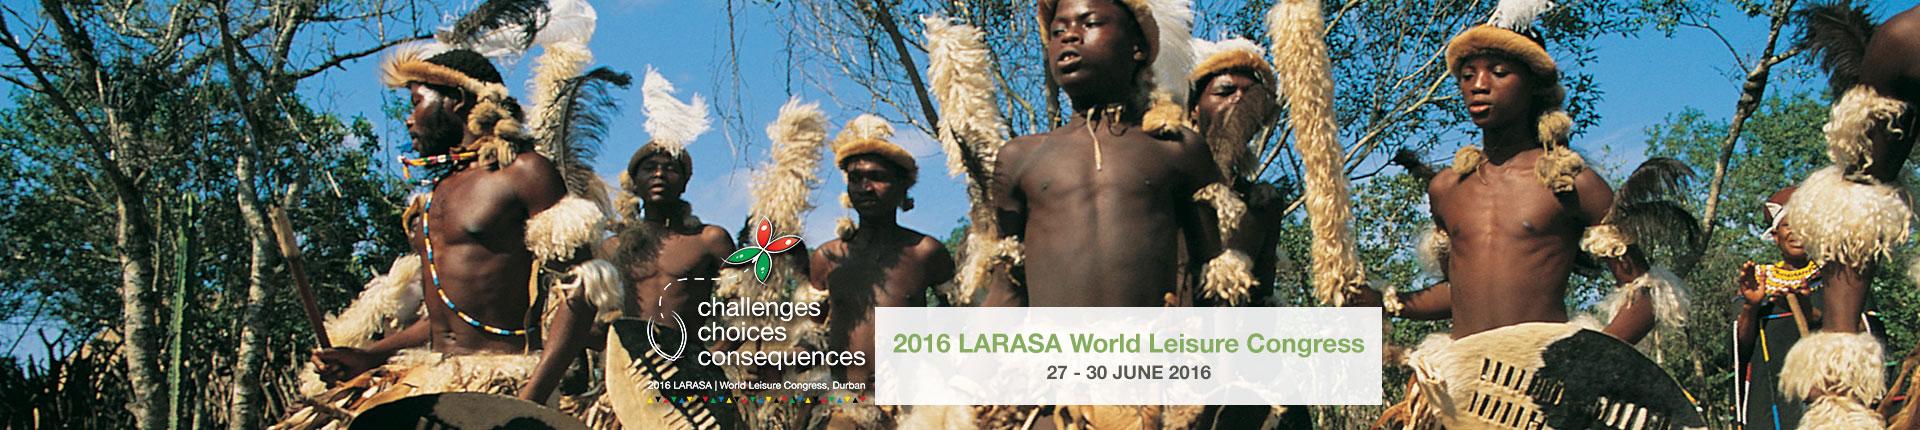 larasa-banners-7